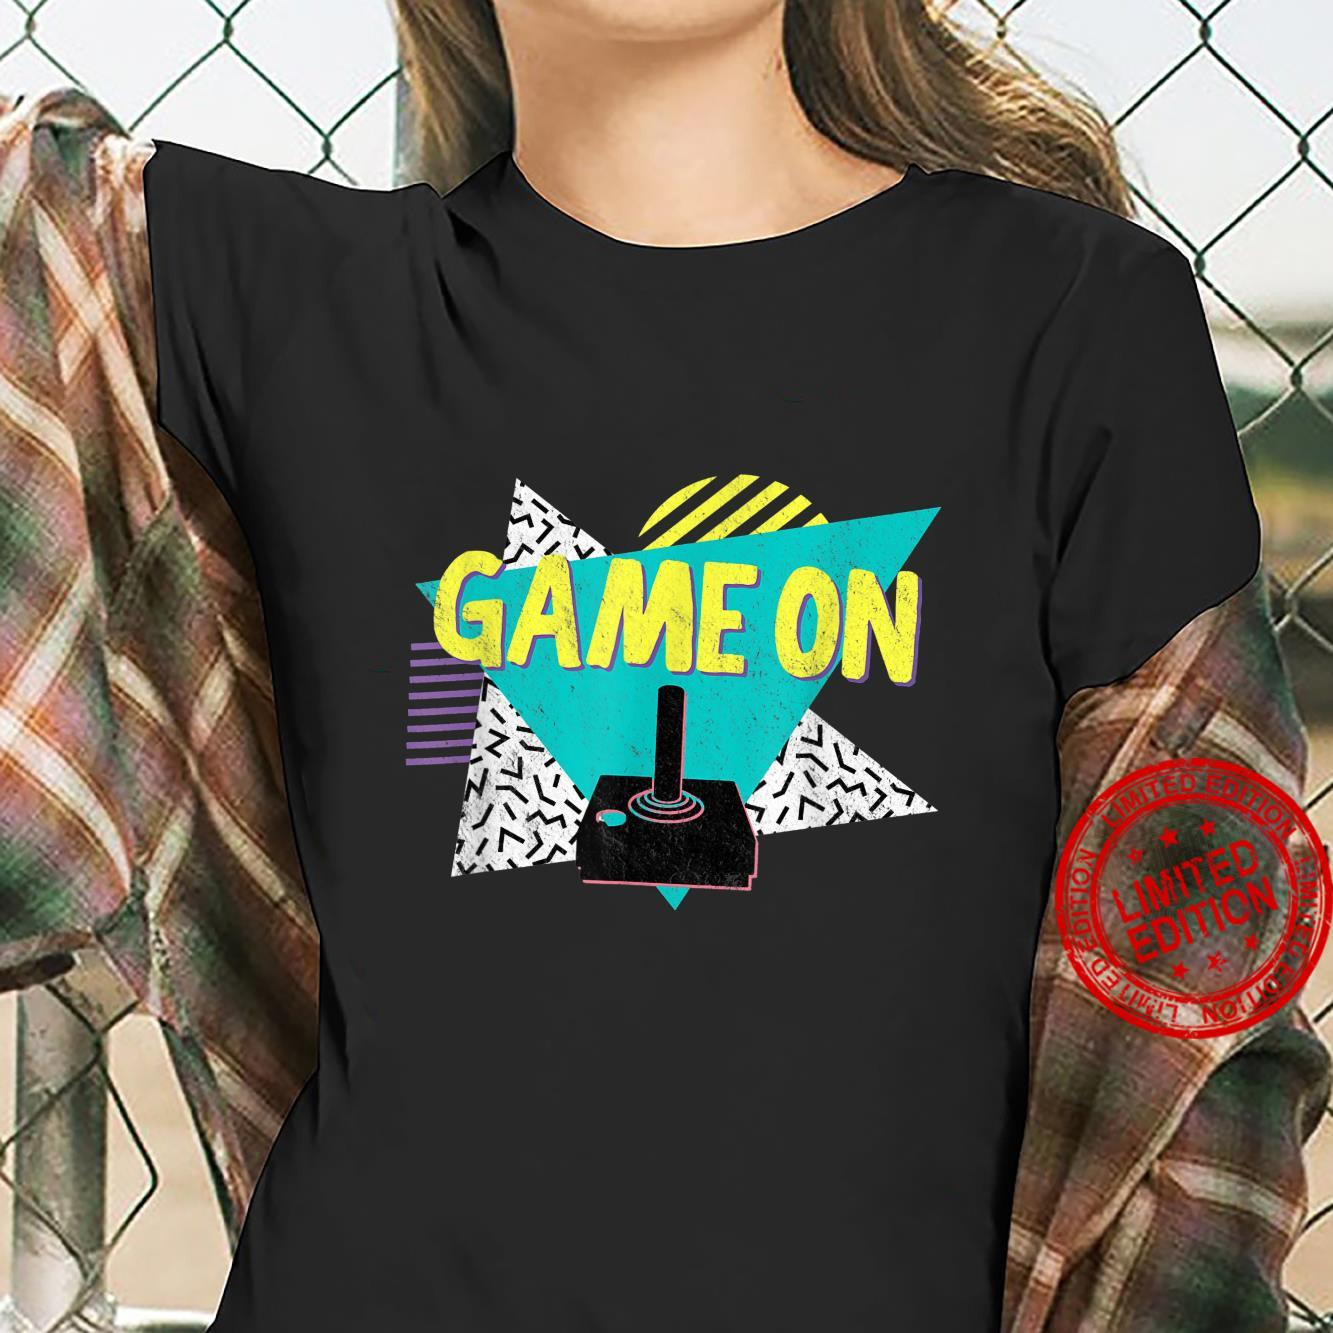 70s or 80s Retro Vintage Video Game Shirt ladies tee